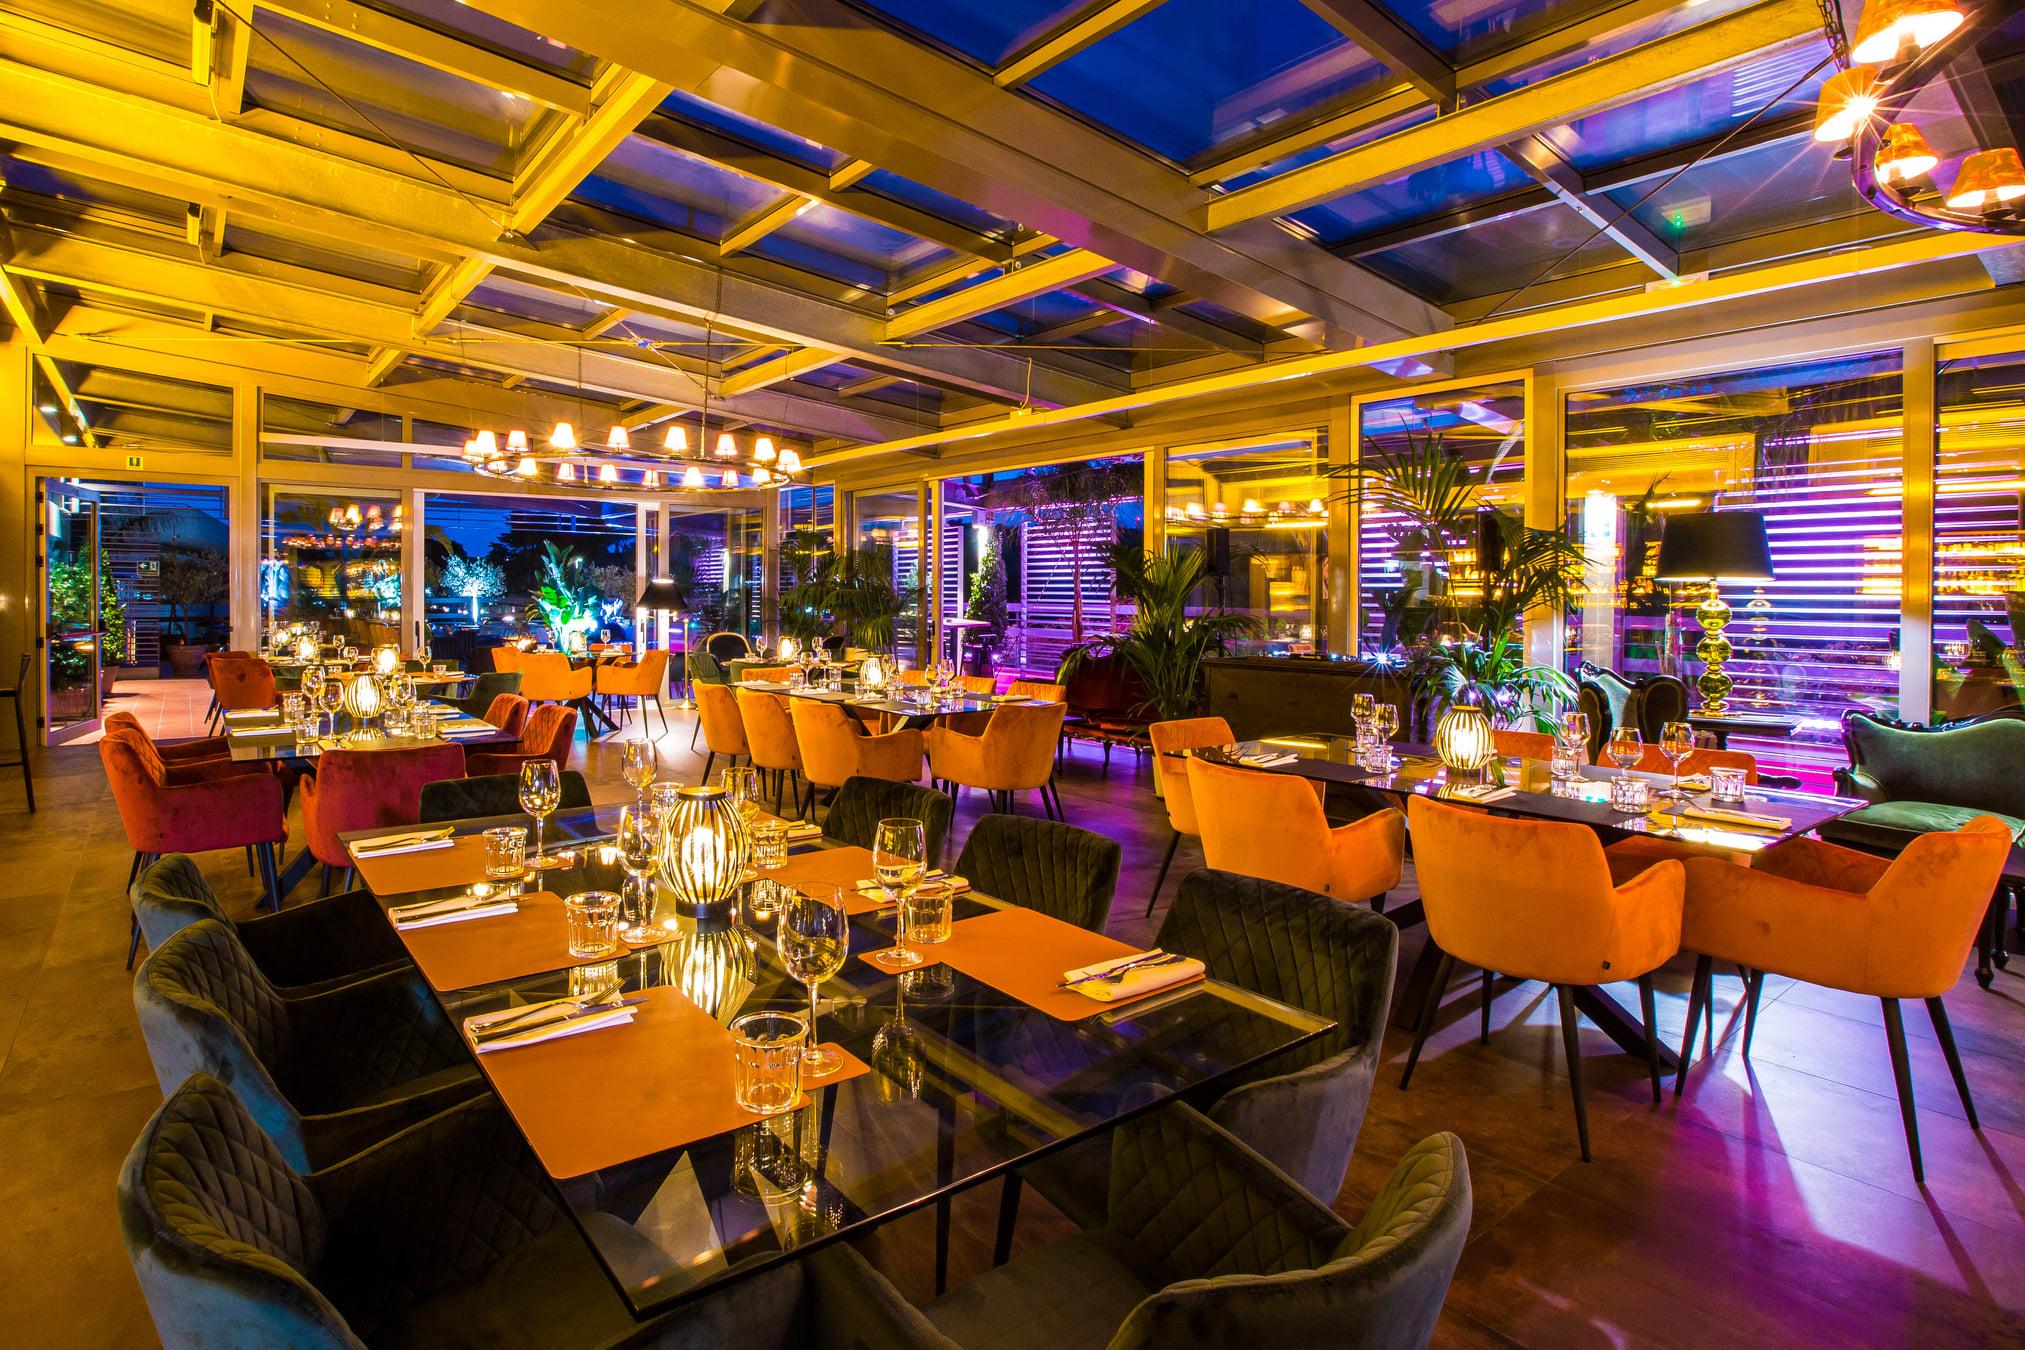 mida terrazza euclide roma cena mercoledi